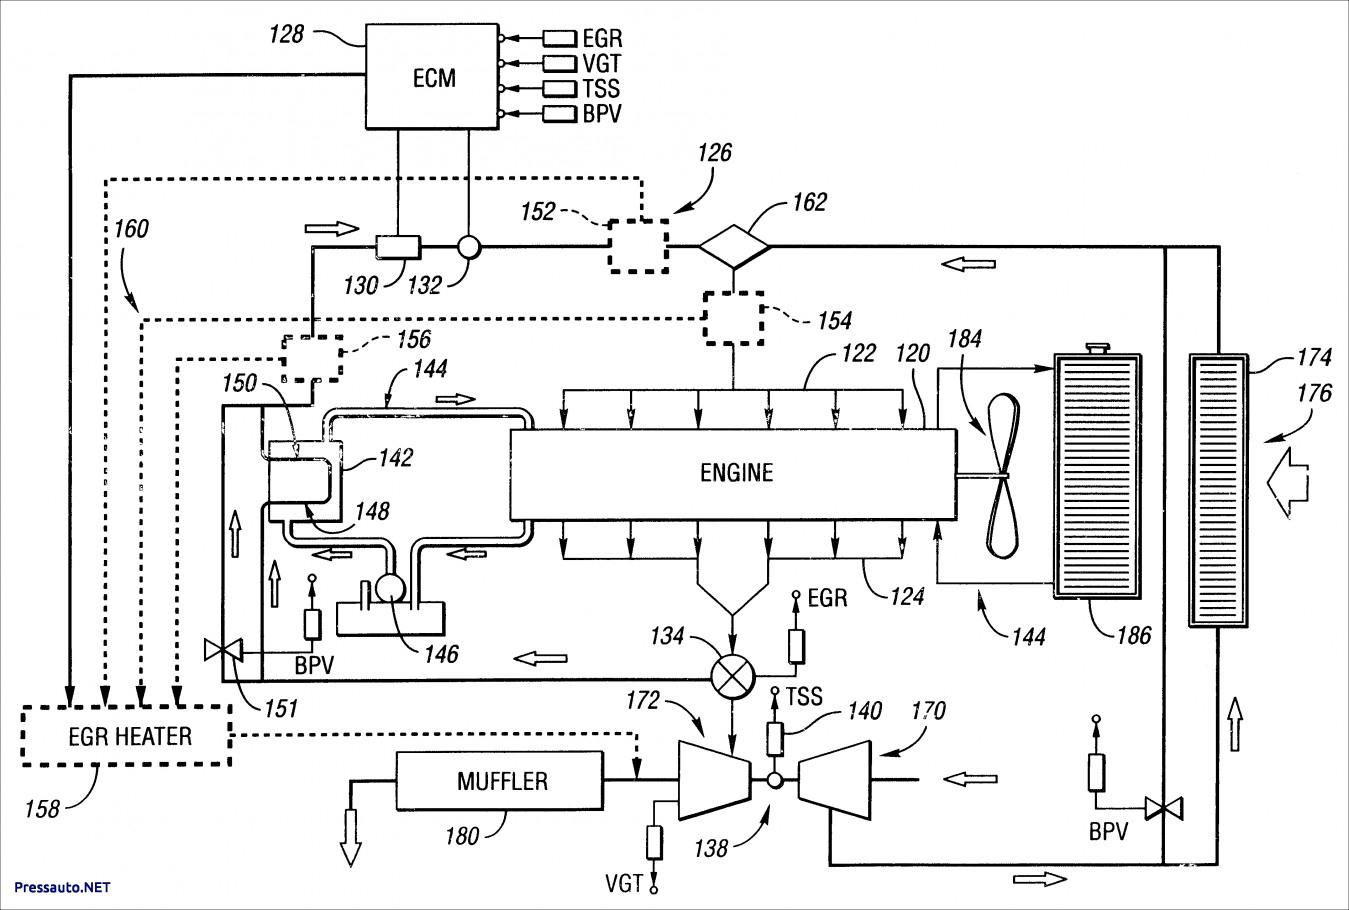 hight resolution of gx160 wiring diagram data wiring diagram today honda gx160 electric start wiring diagram